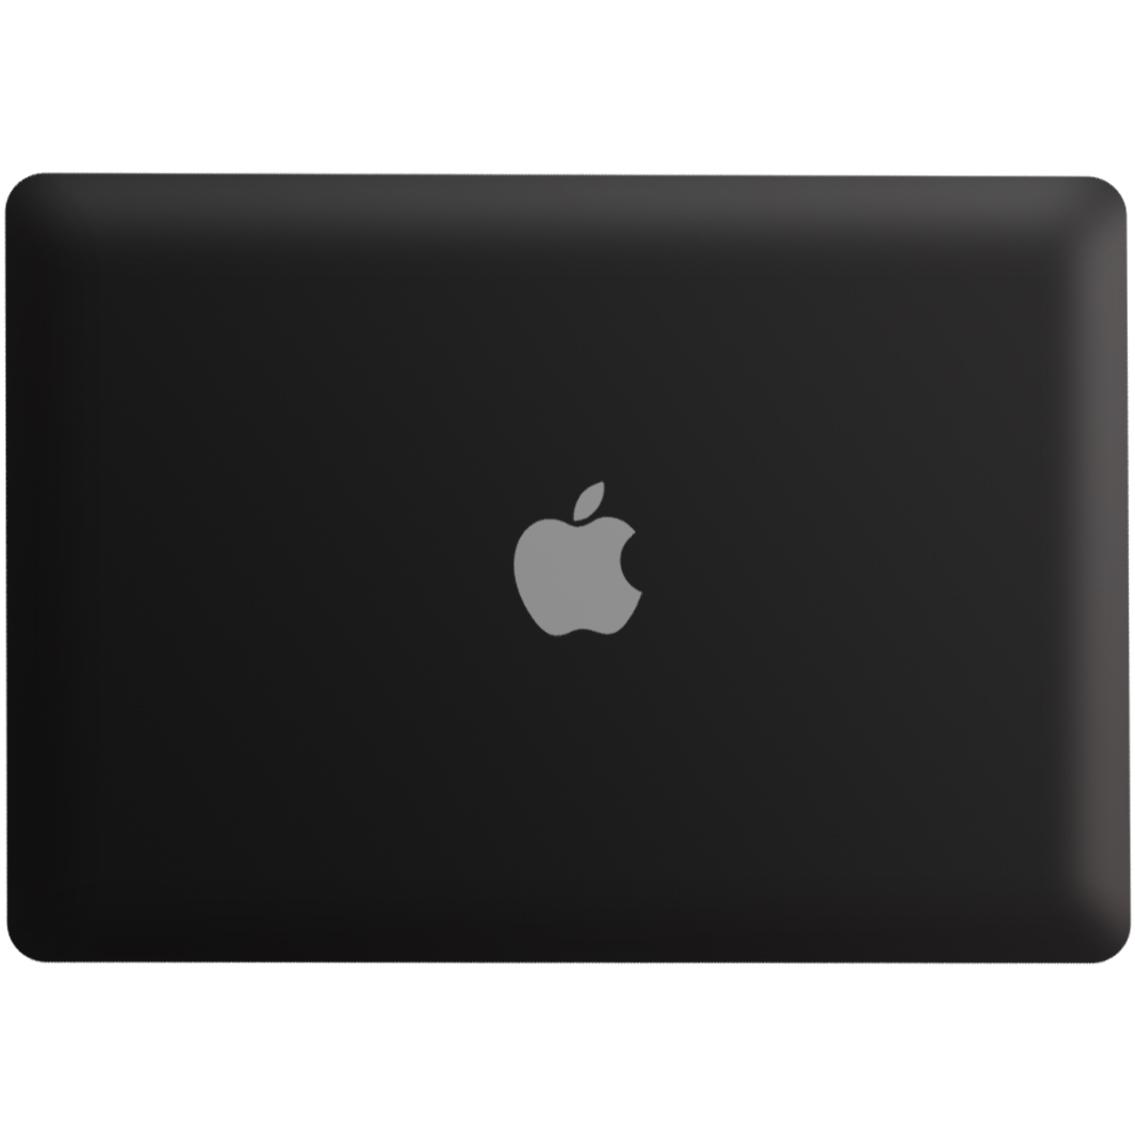 Neon Party Macbook Case